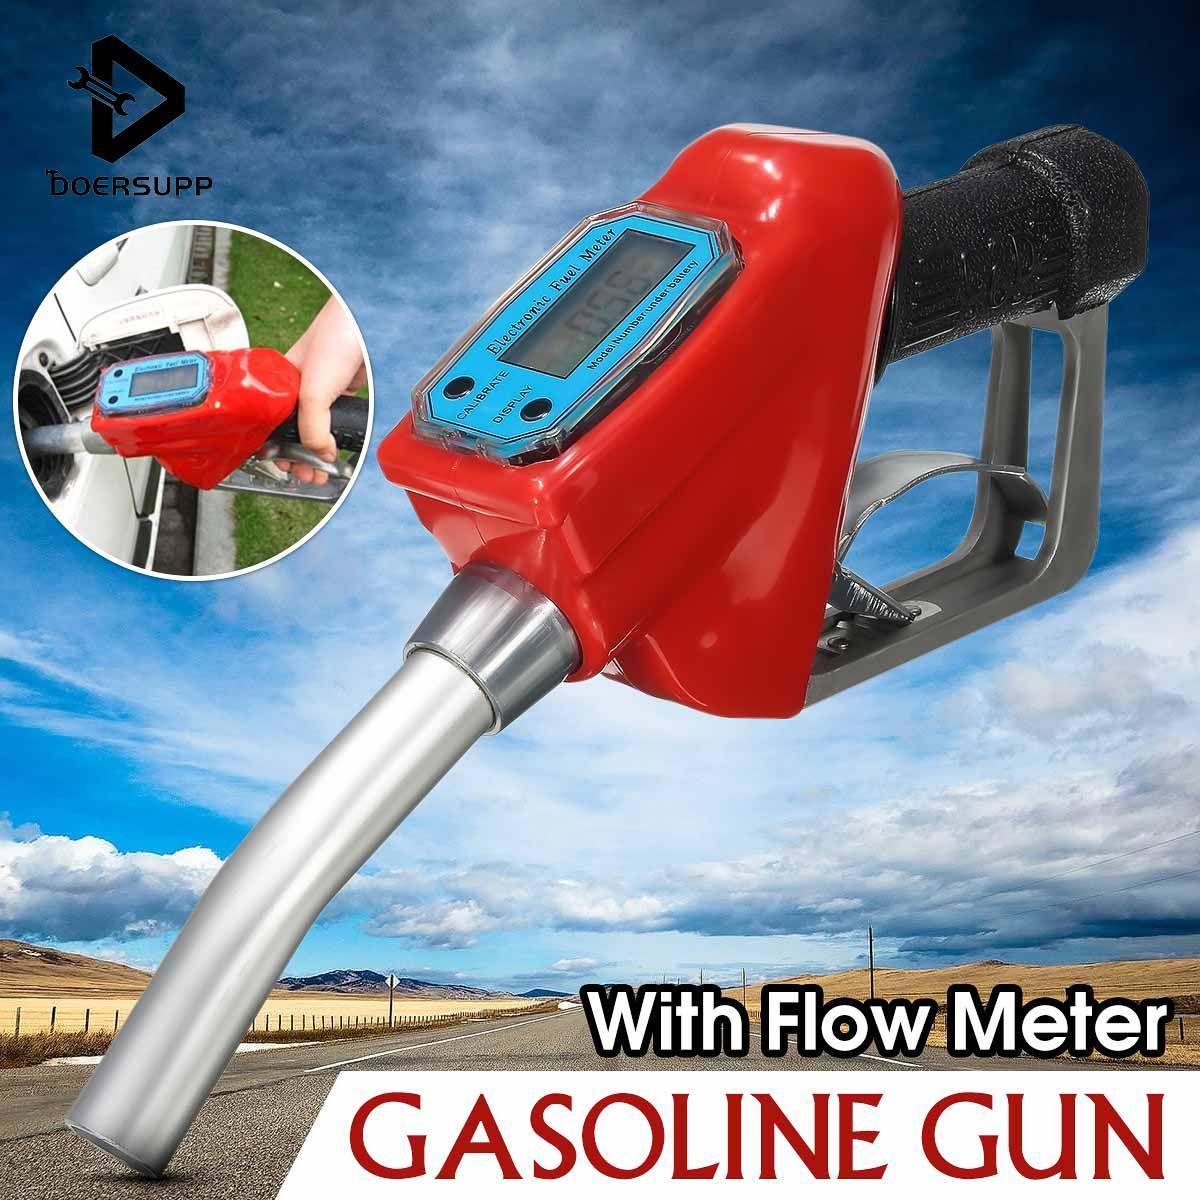 Doersupp Gas Flow Meter Sensor Flowmeter Indicator Counter Fuel Gauge Oil Delivery Gun Nozzle Gasoline Station Oil Refueling Gun